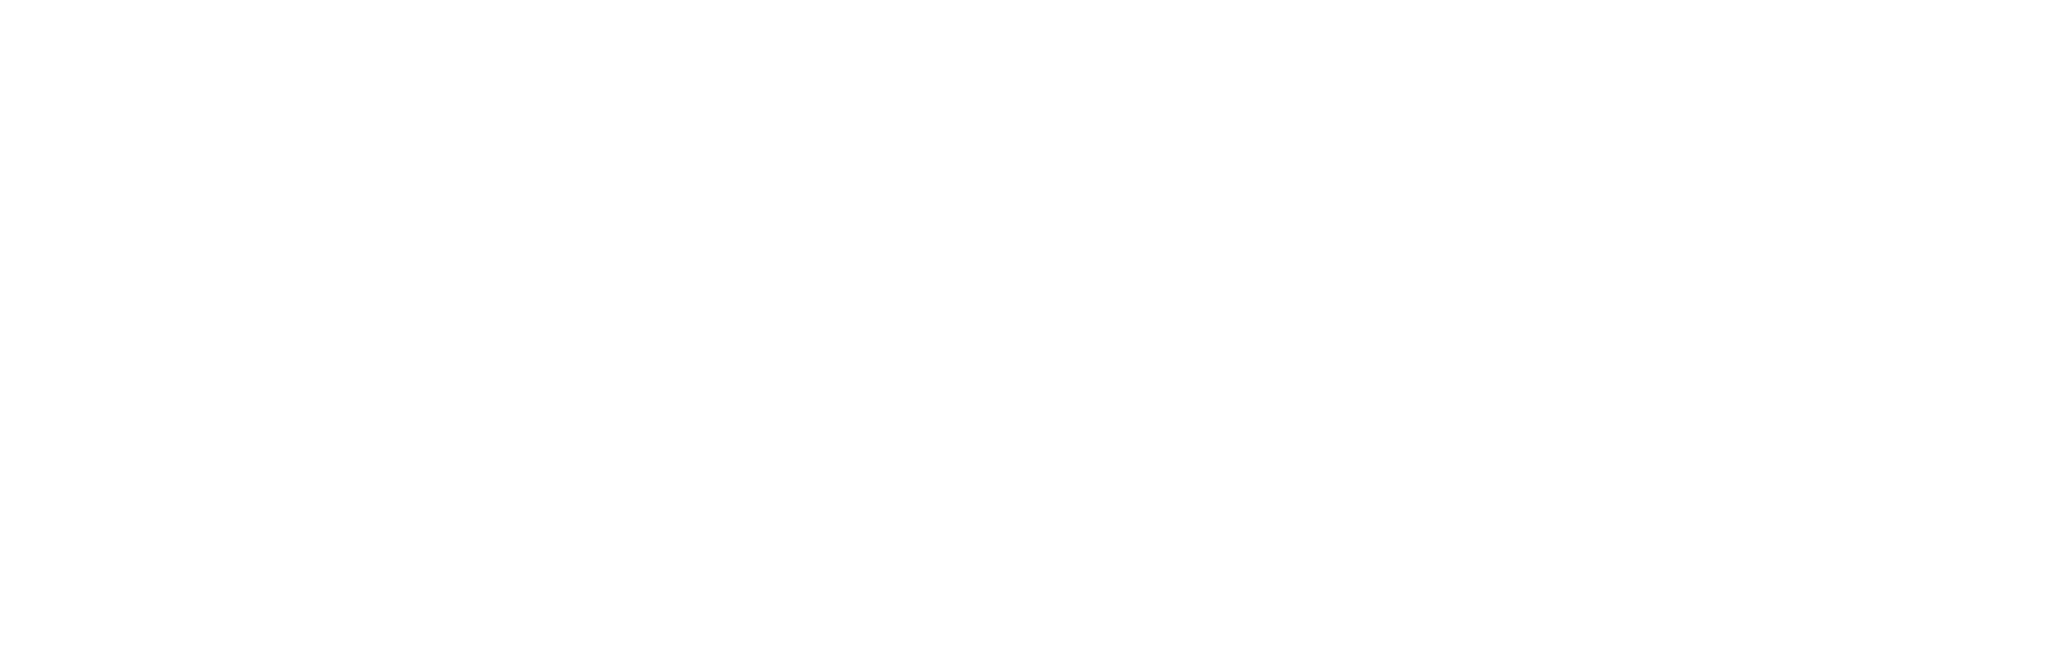 Oslo BDSM